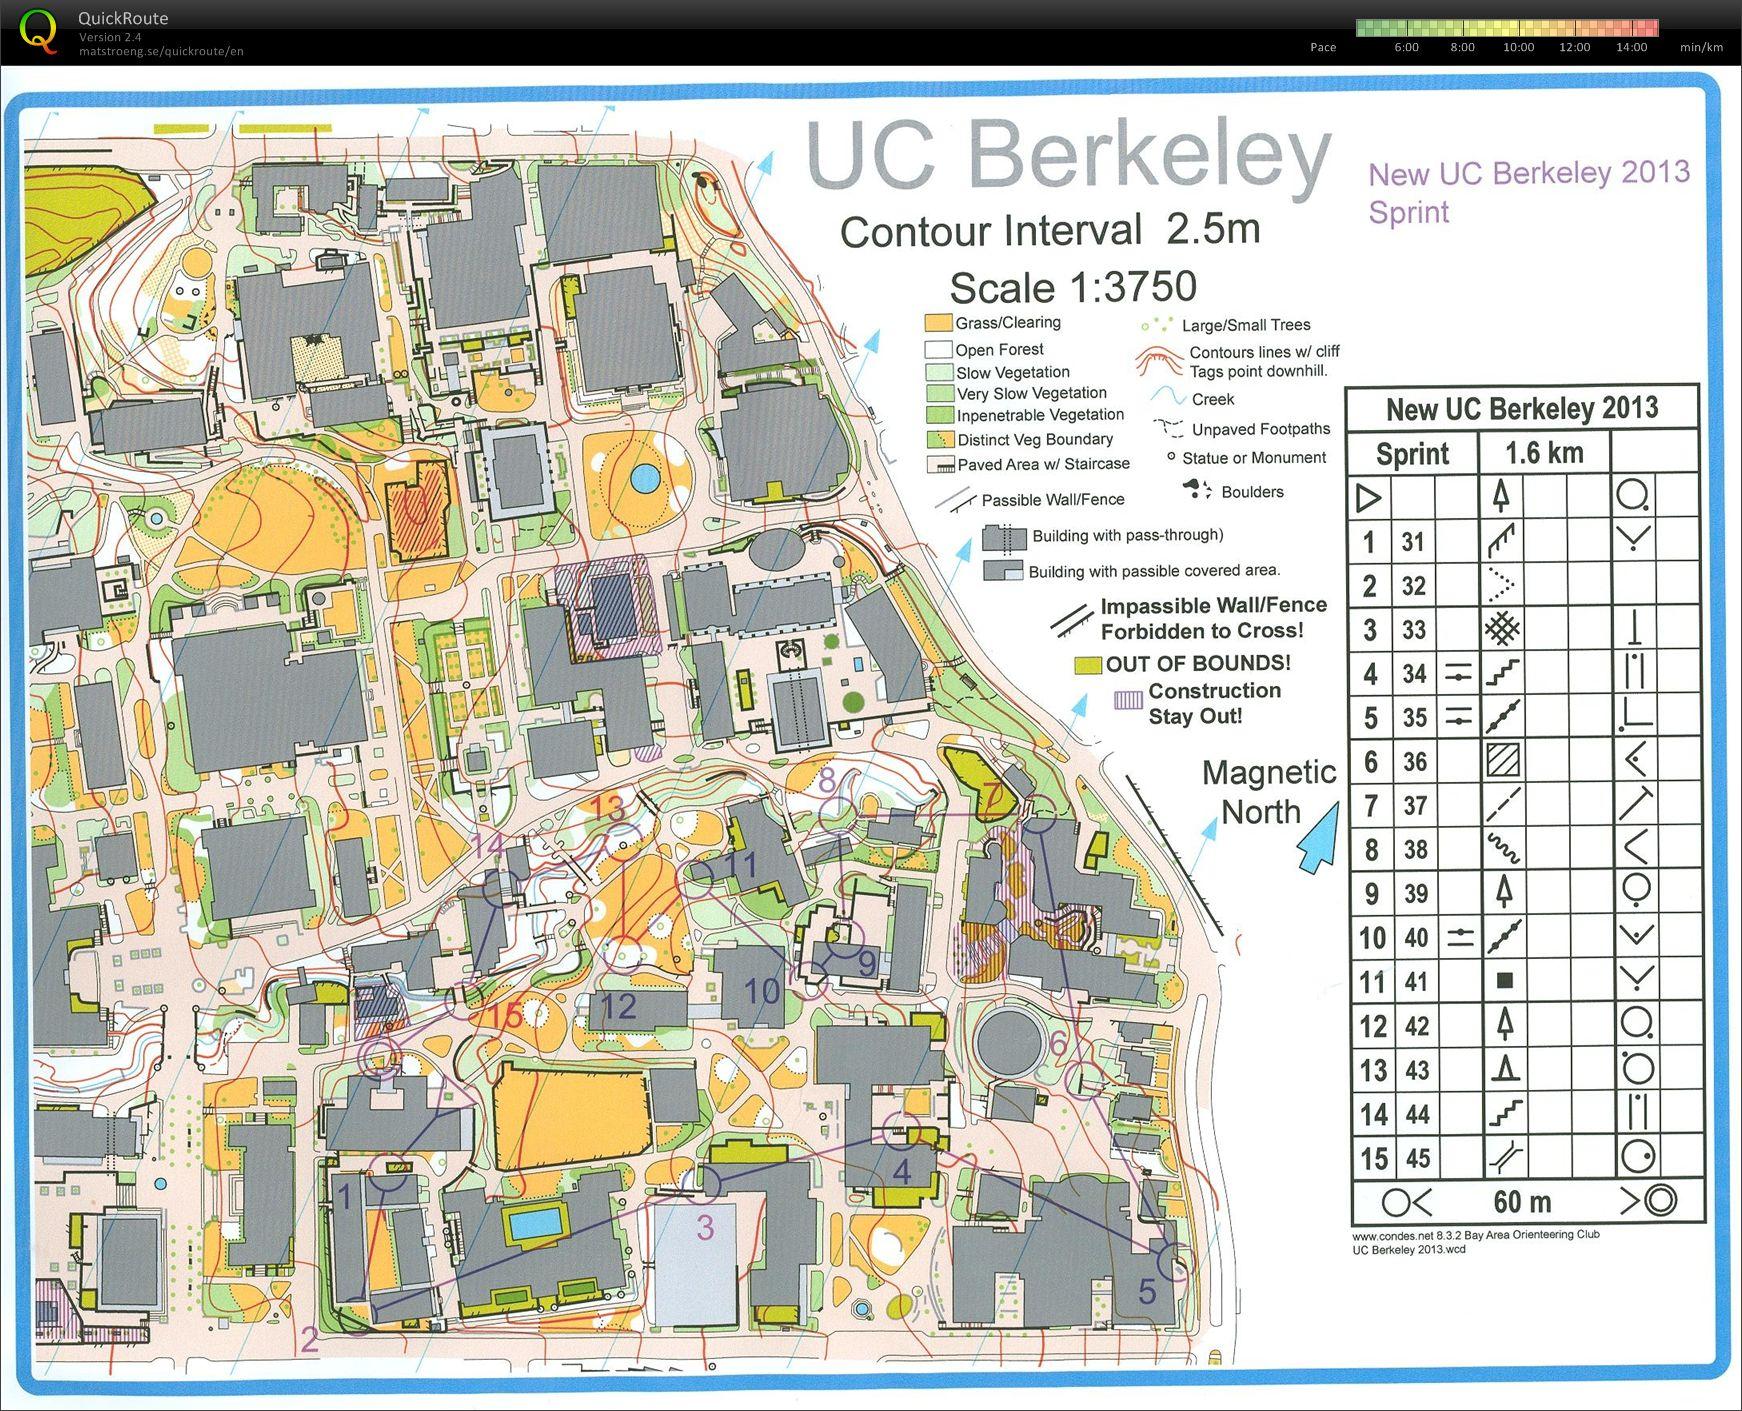 UC Berkeley Sprint - March 3rd 2013 - Orienteering Map from Charlie ...